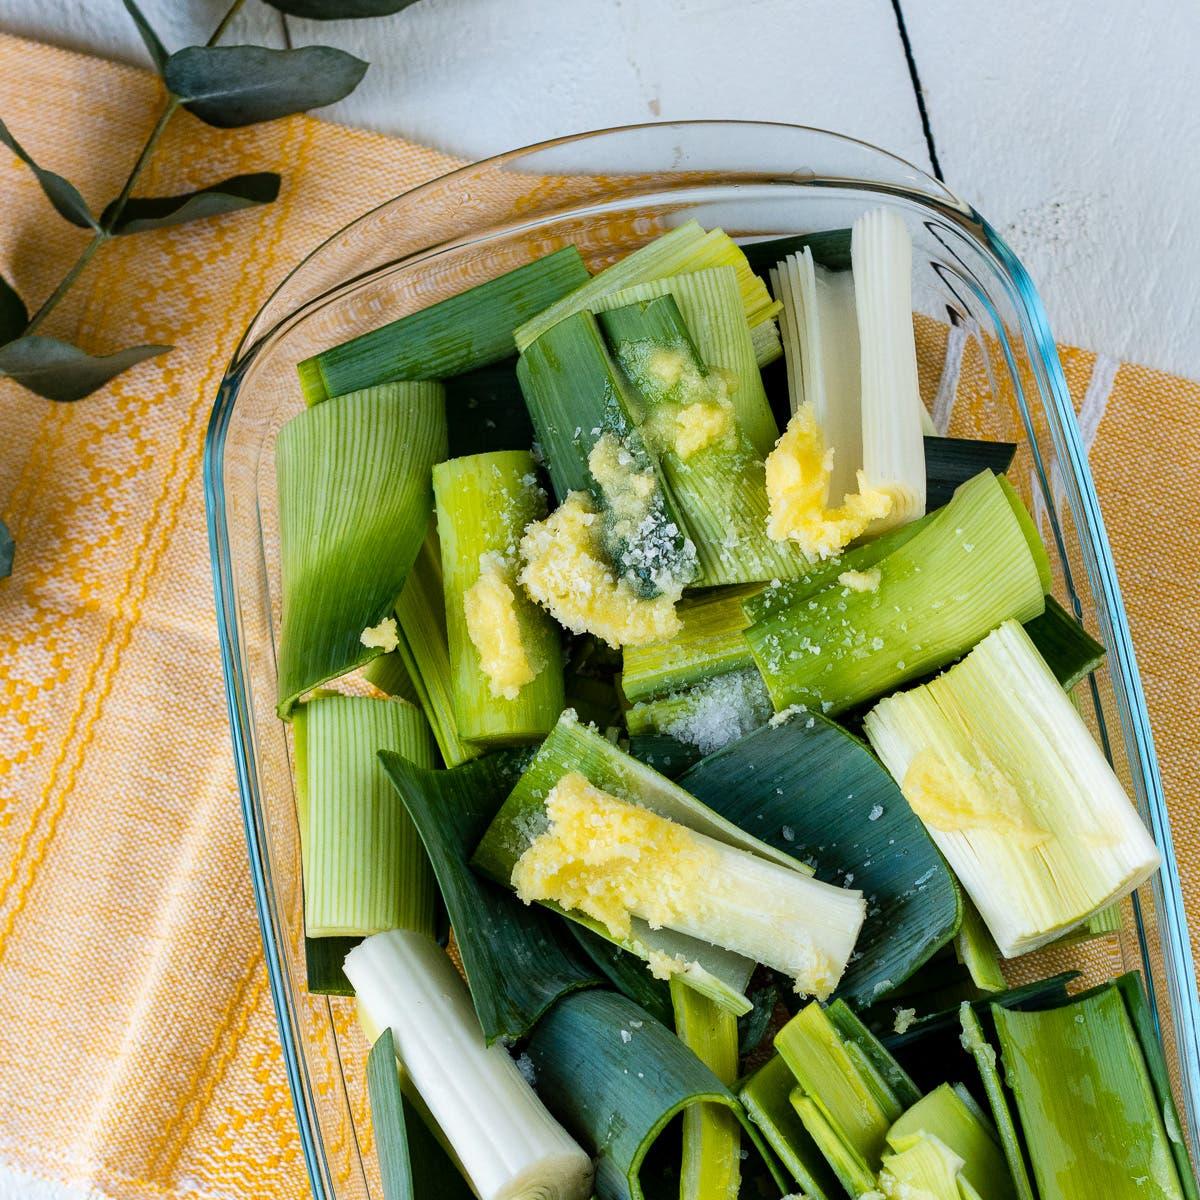 Gesunde Frühlingsrezepte: Geschmorter Lauch aus dem Ofen mit Ghee